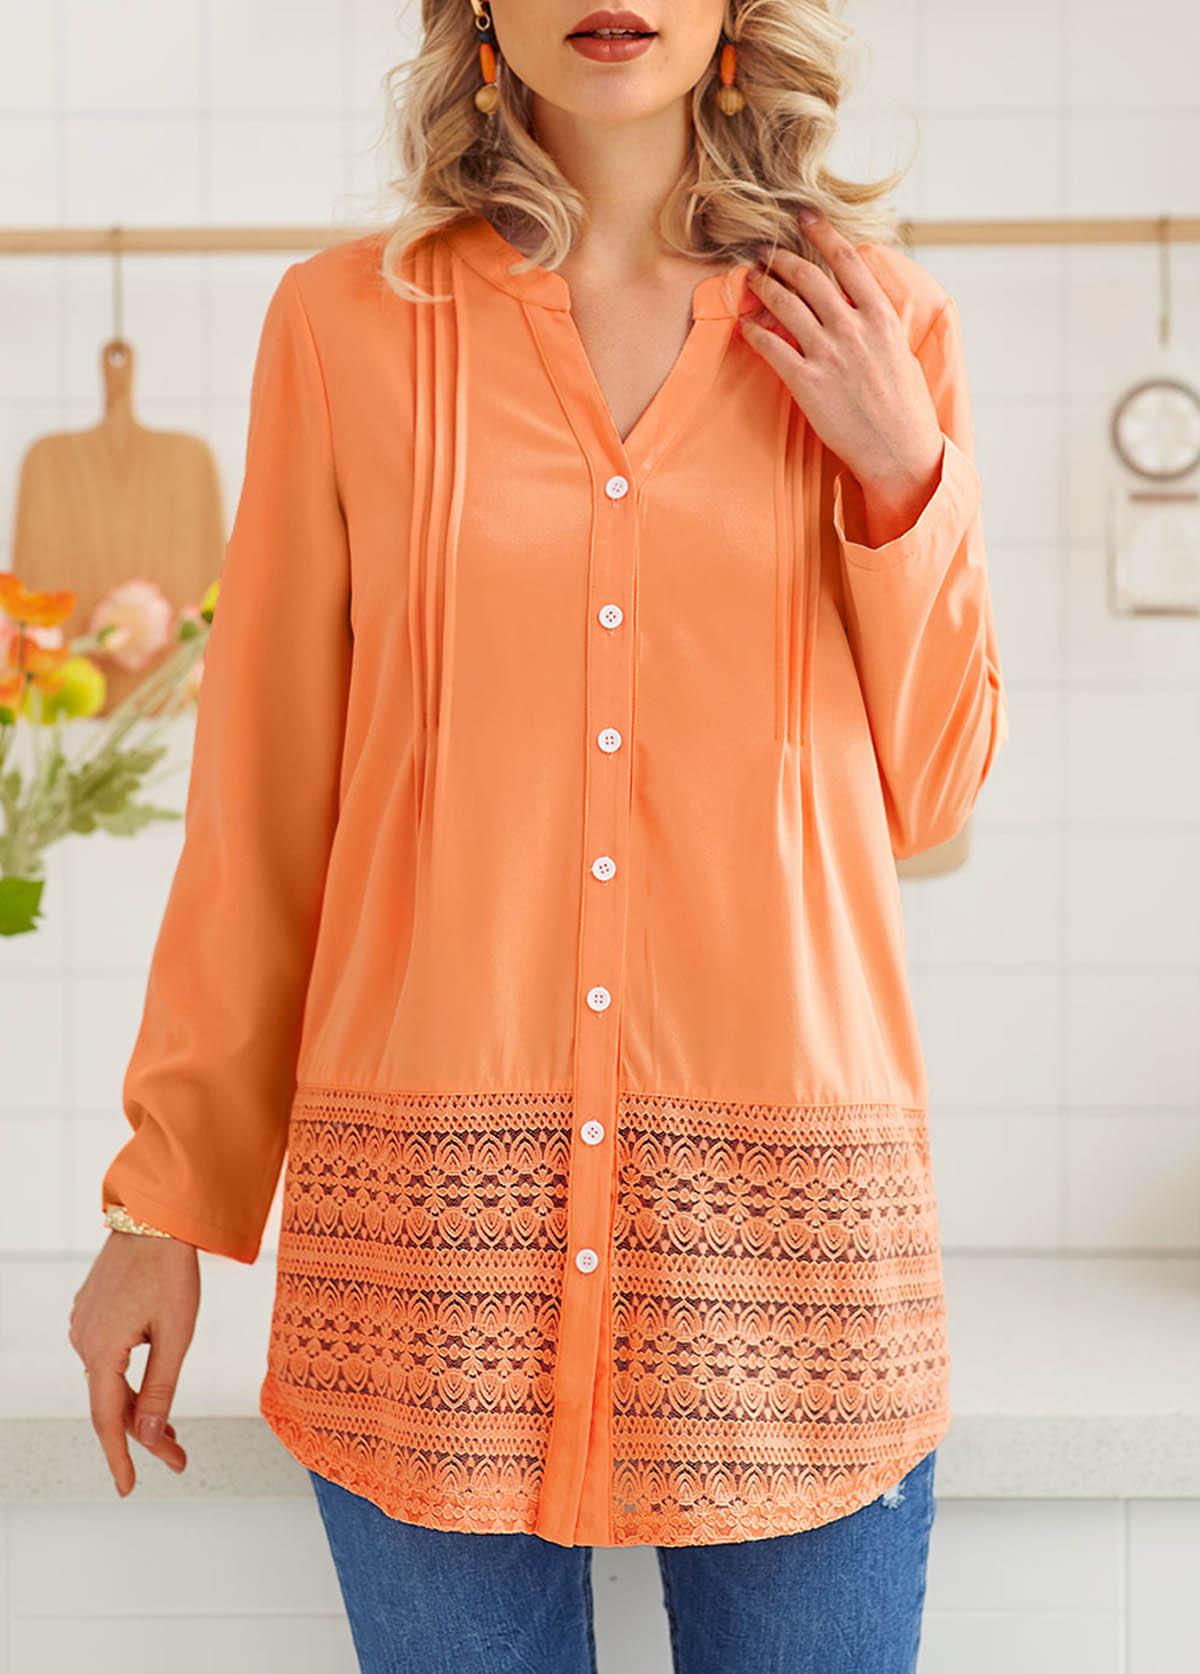 ROTITA Button Up Long Sleeve Lace Stitching Blouse